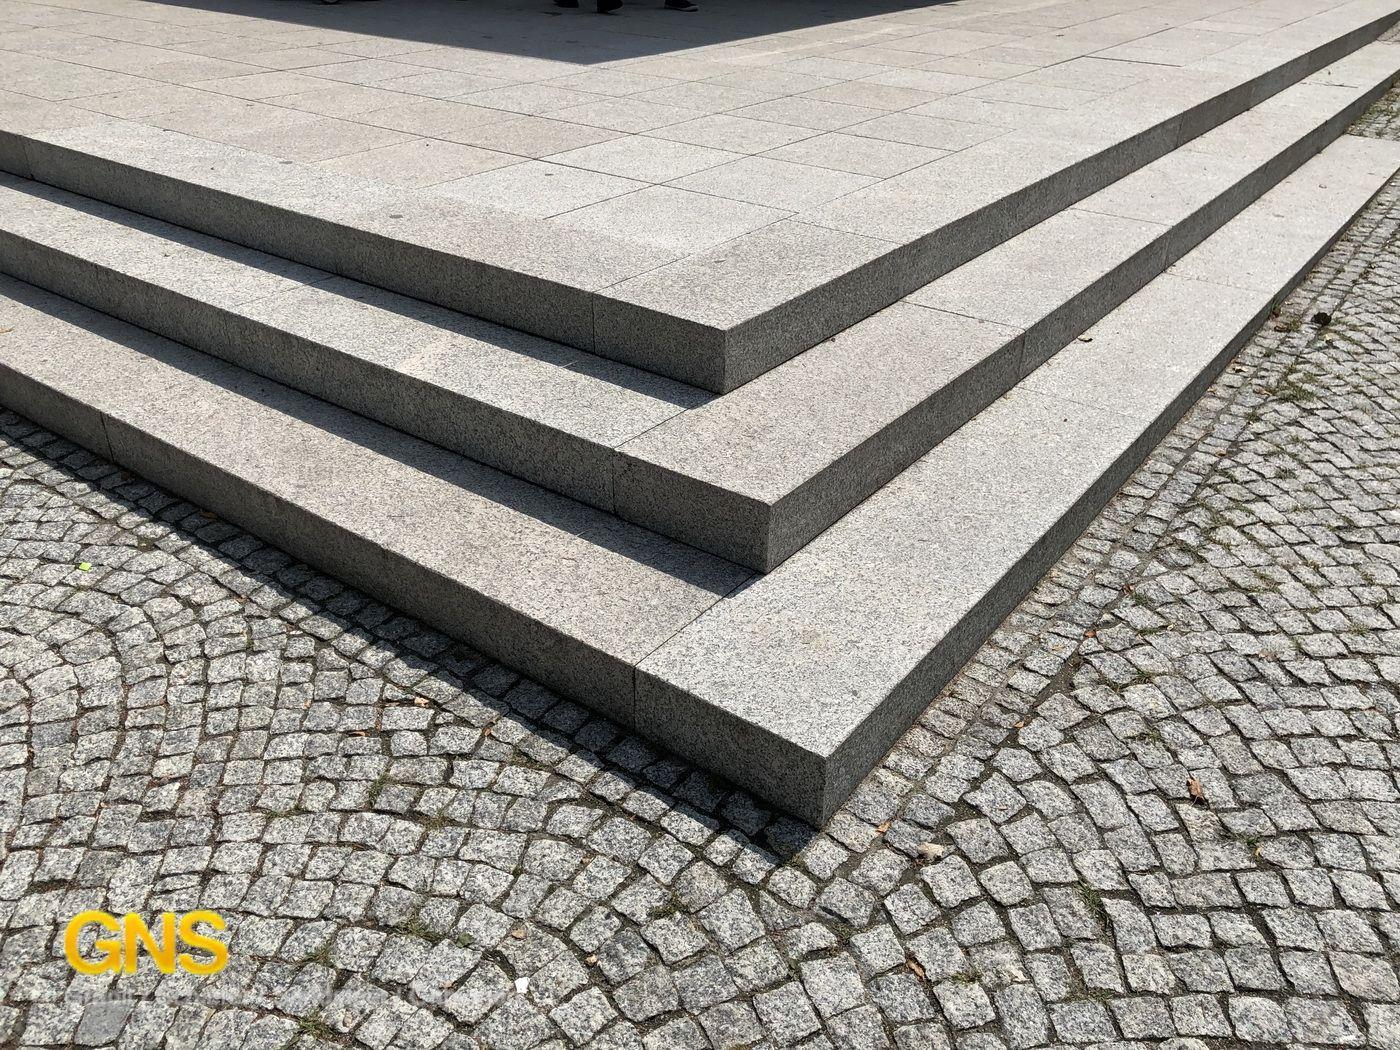 Granitplatten Einfahrt Terrassenplatten Grau Hellgrau Granitfliesen Granitplatten Terrassenplatten Grau